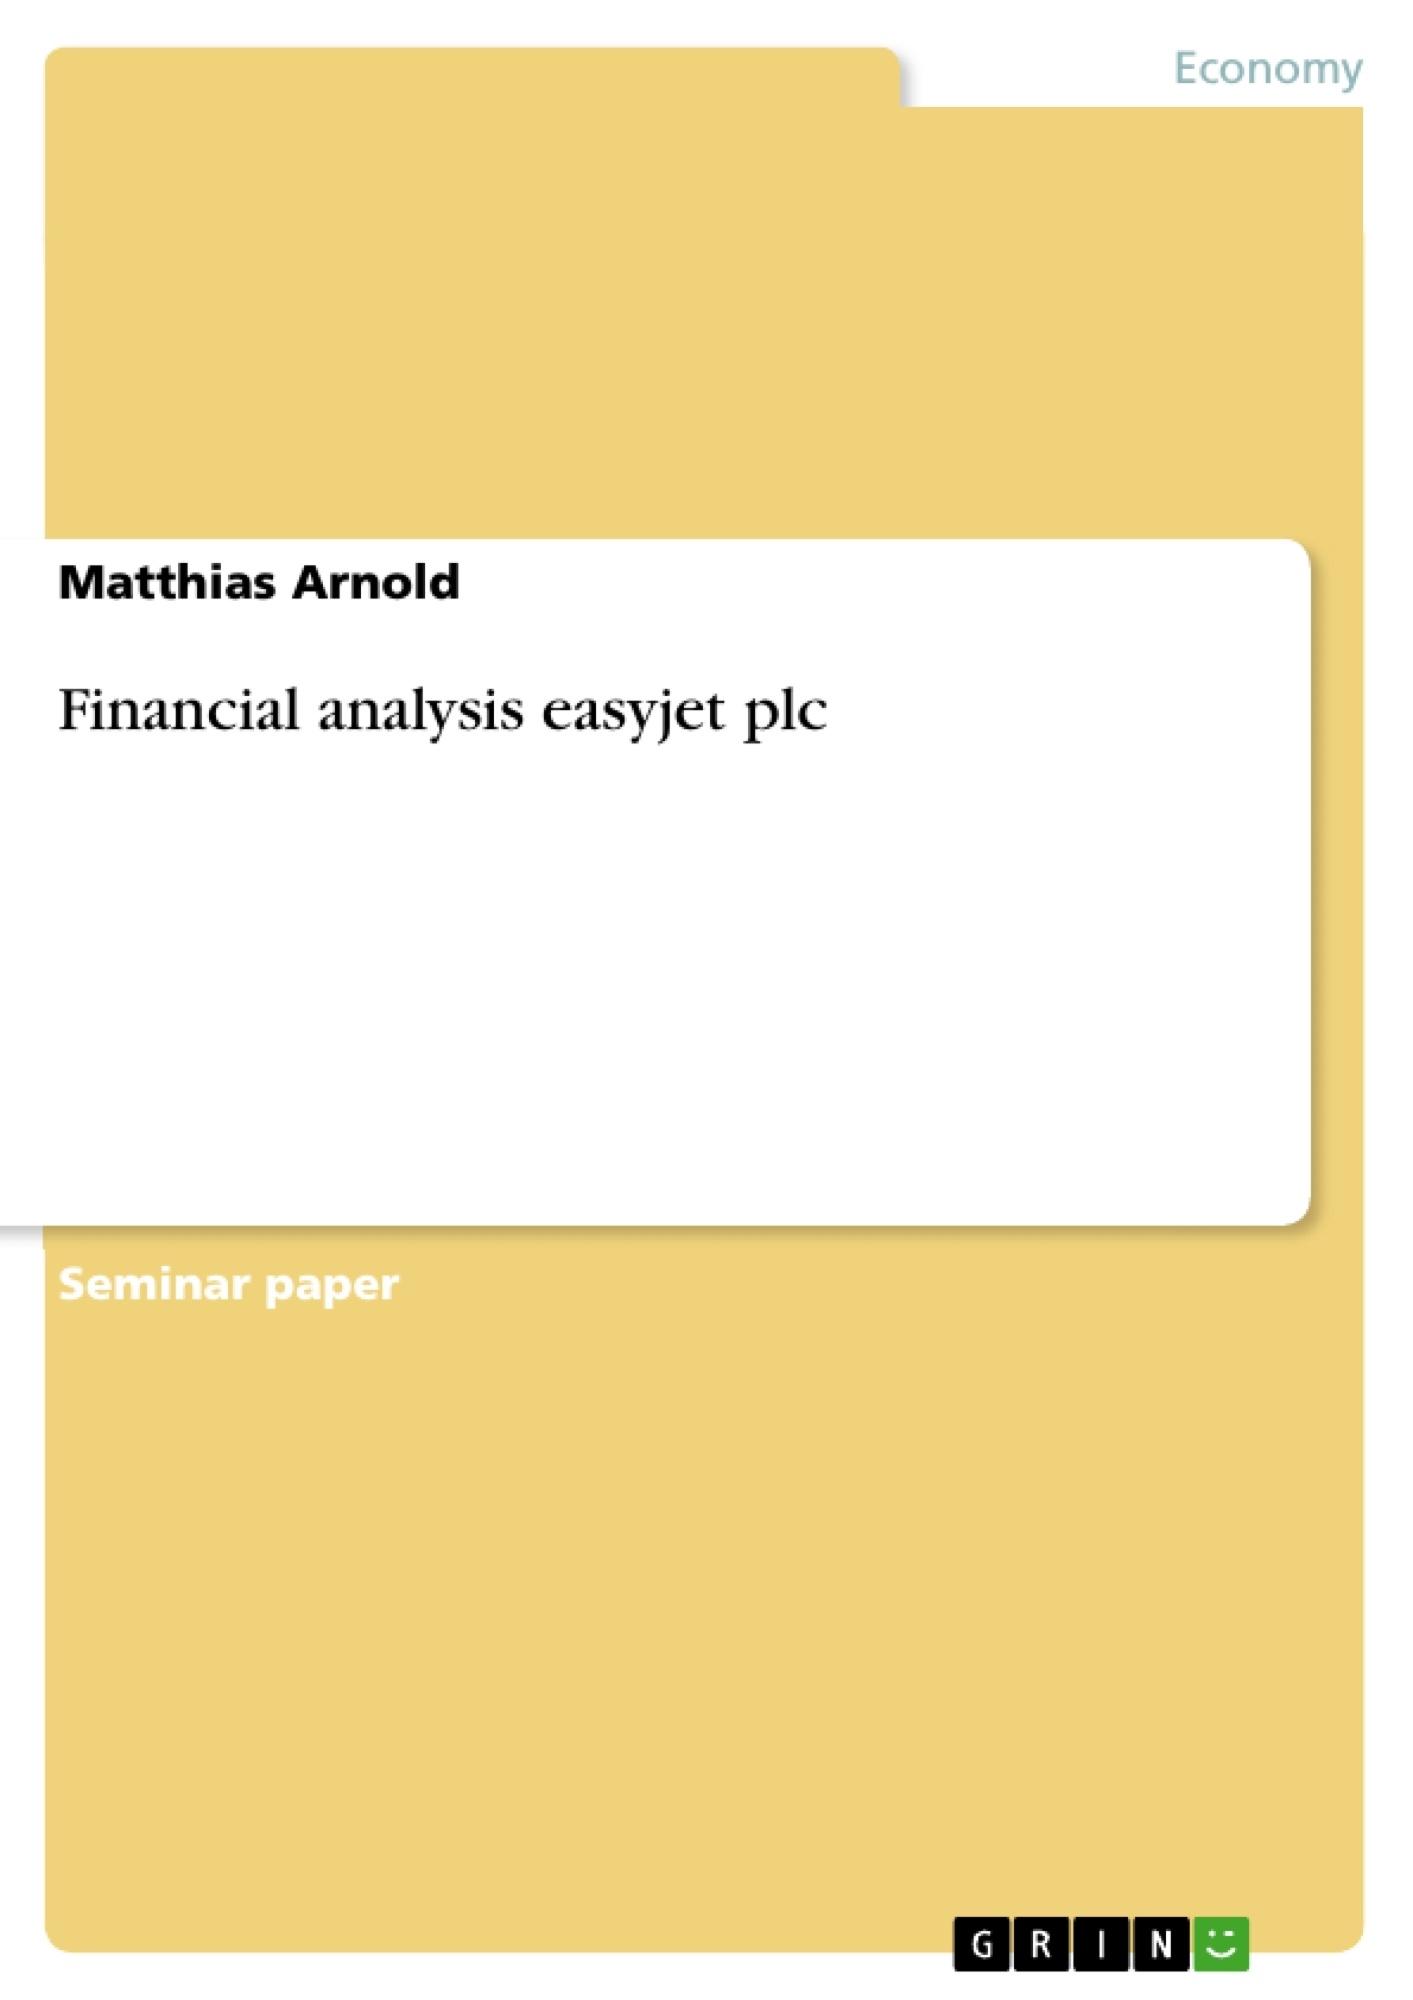 Title: Financial analysis easyjet plc